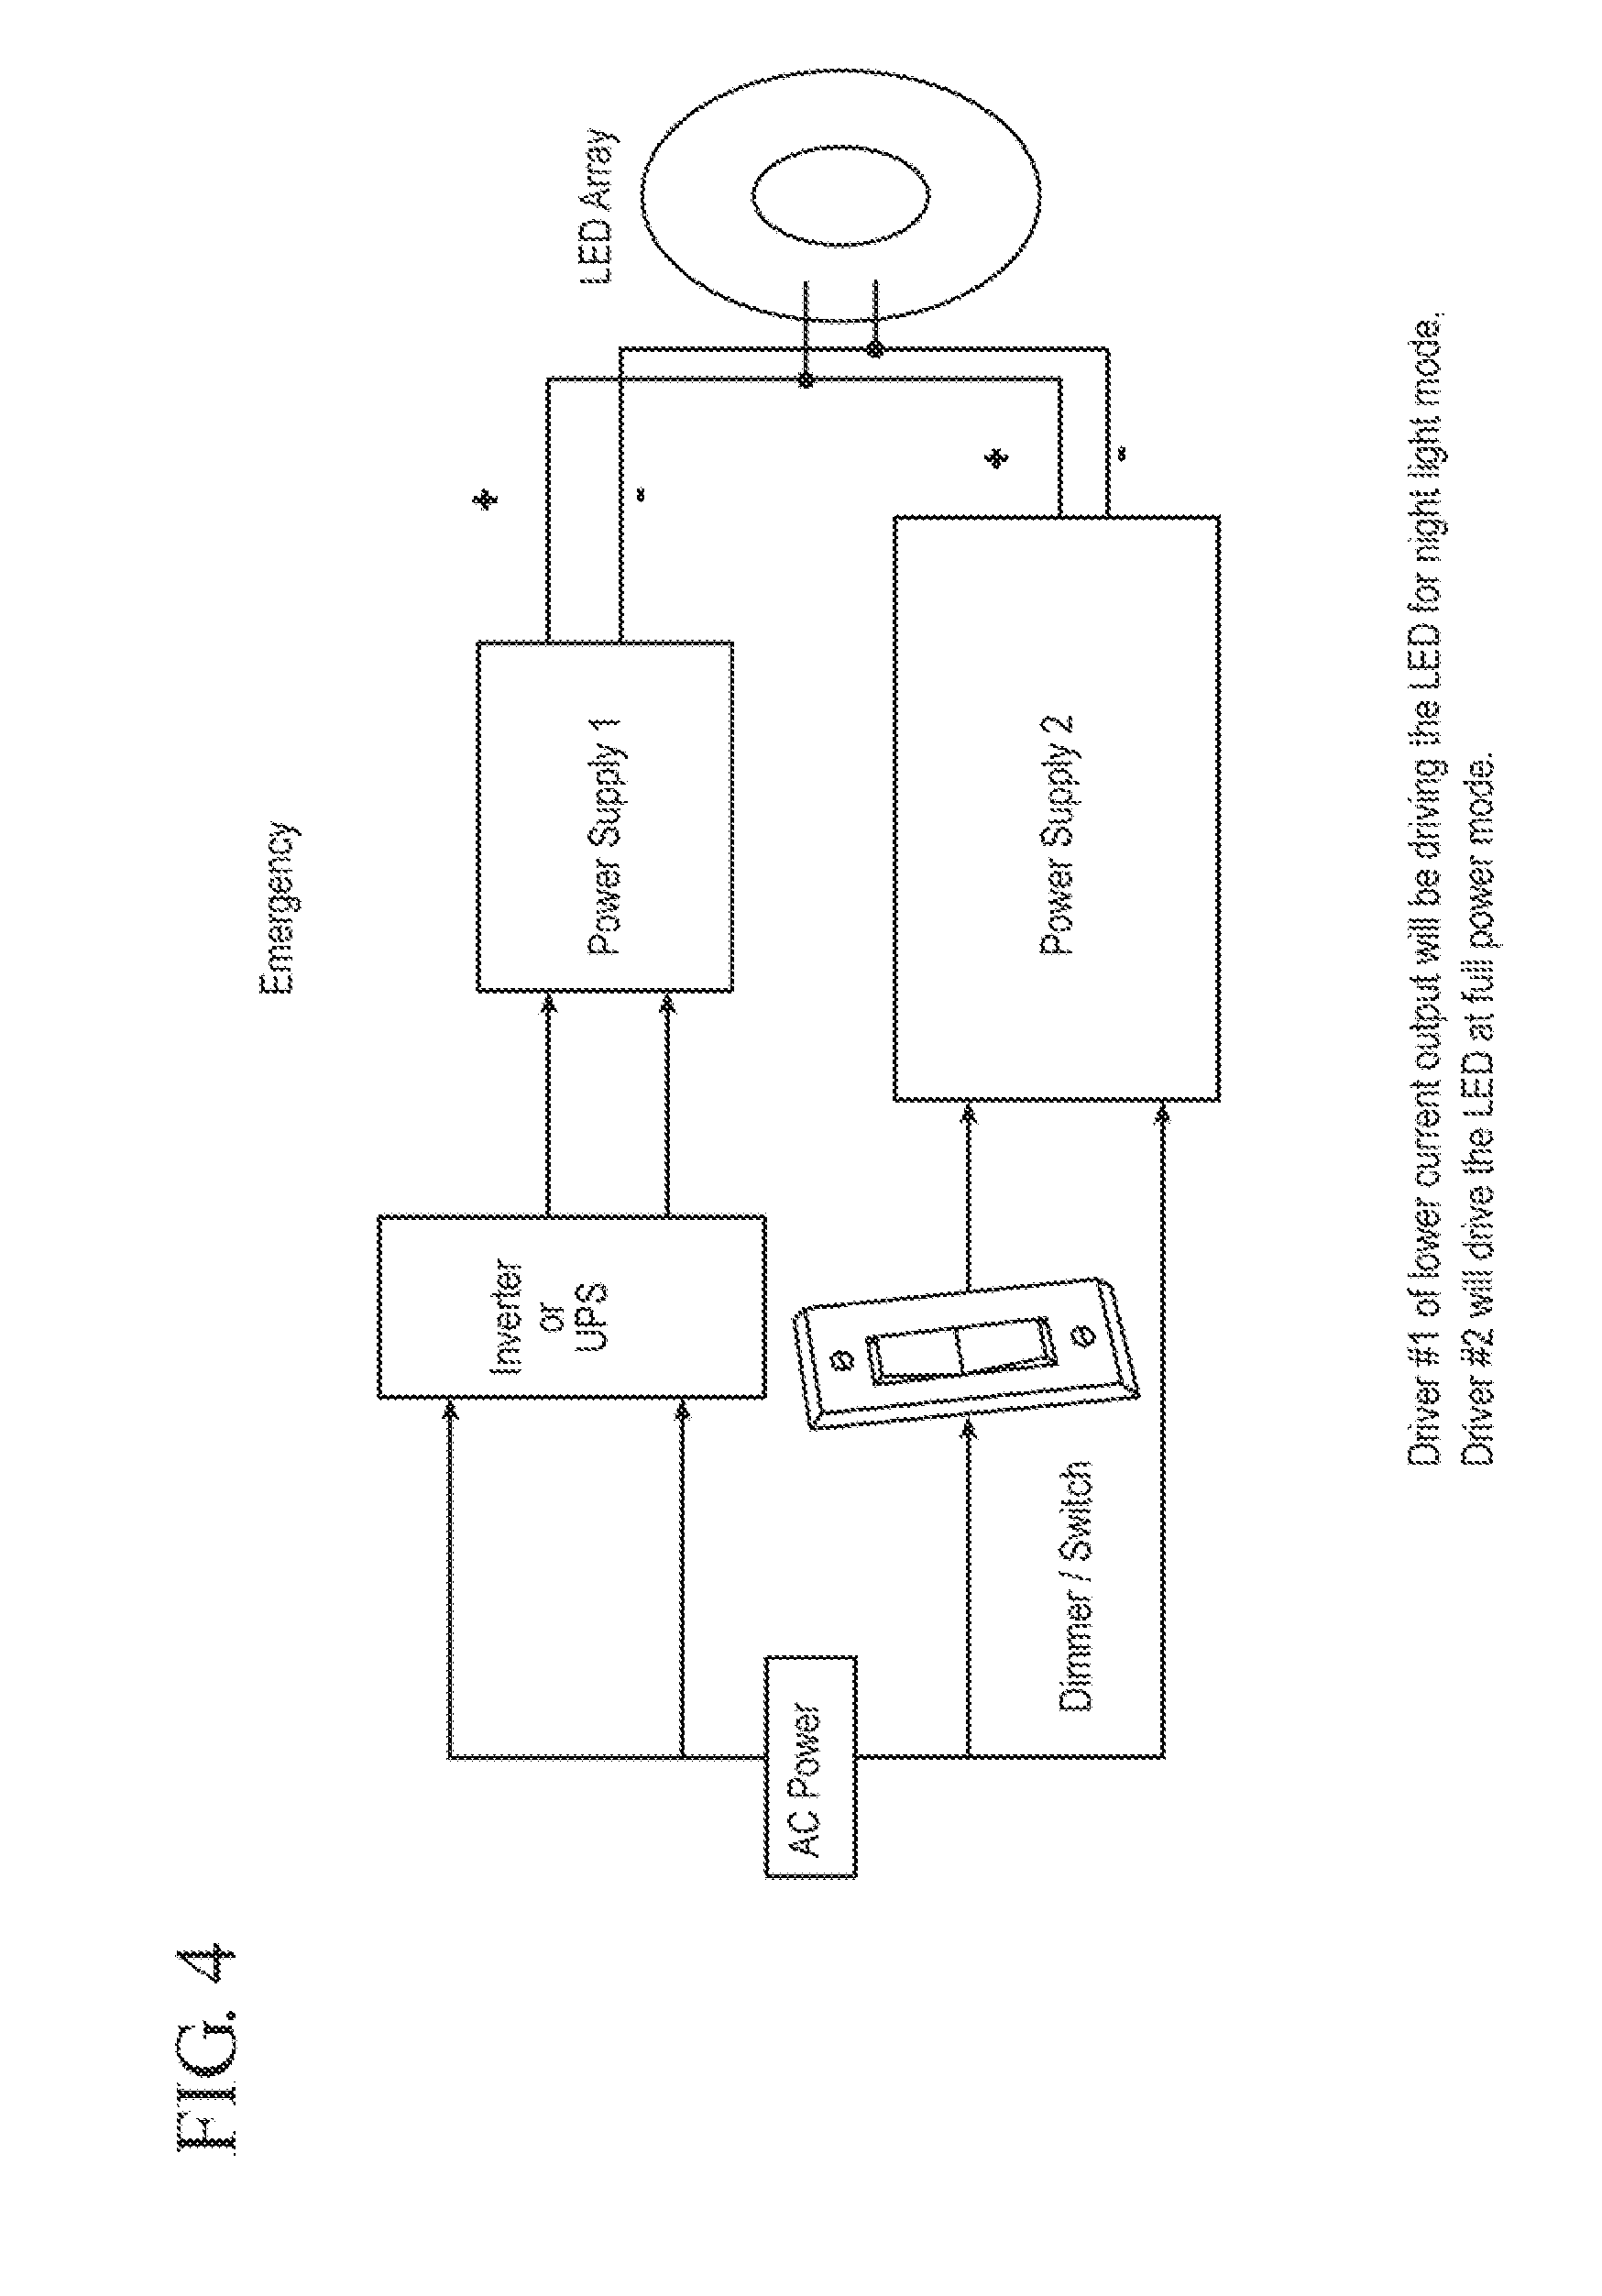 Wiring Diagram For Philips Bodine Eli